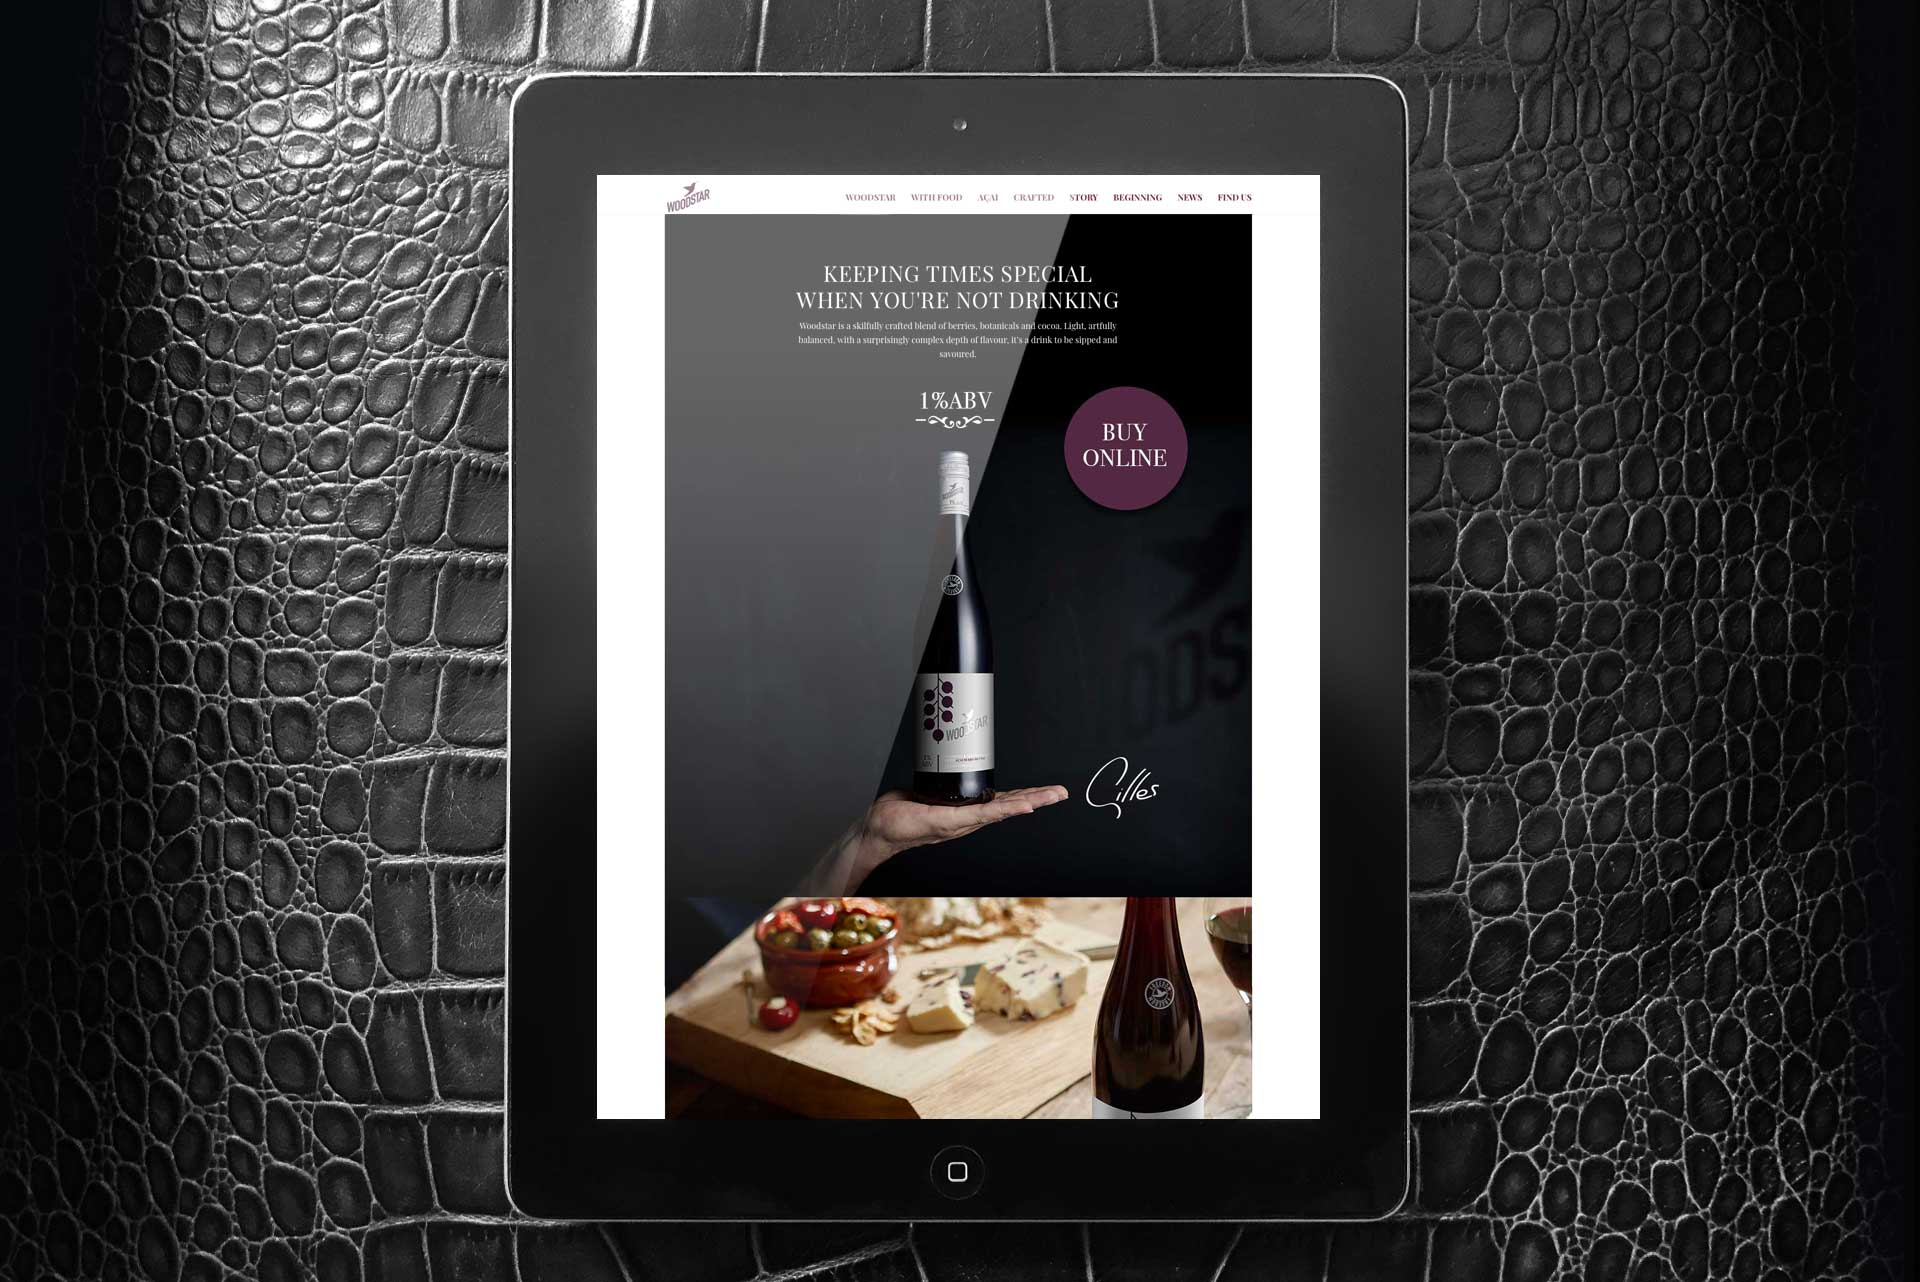 iPad with Woodstar Drink Website